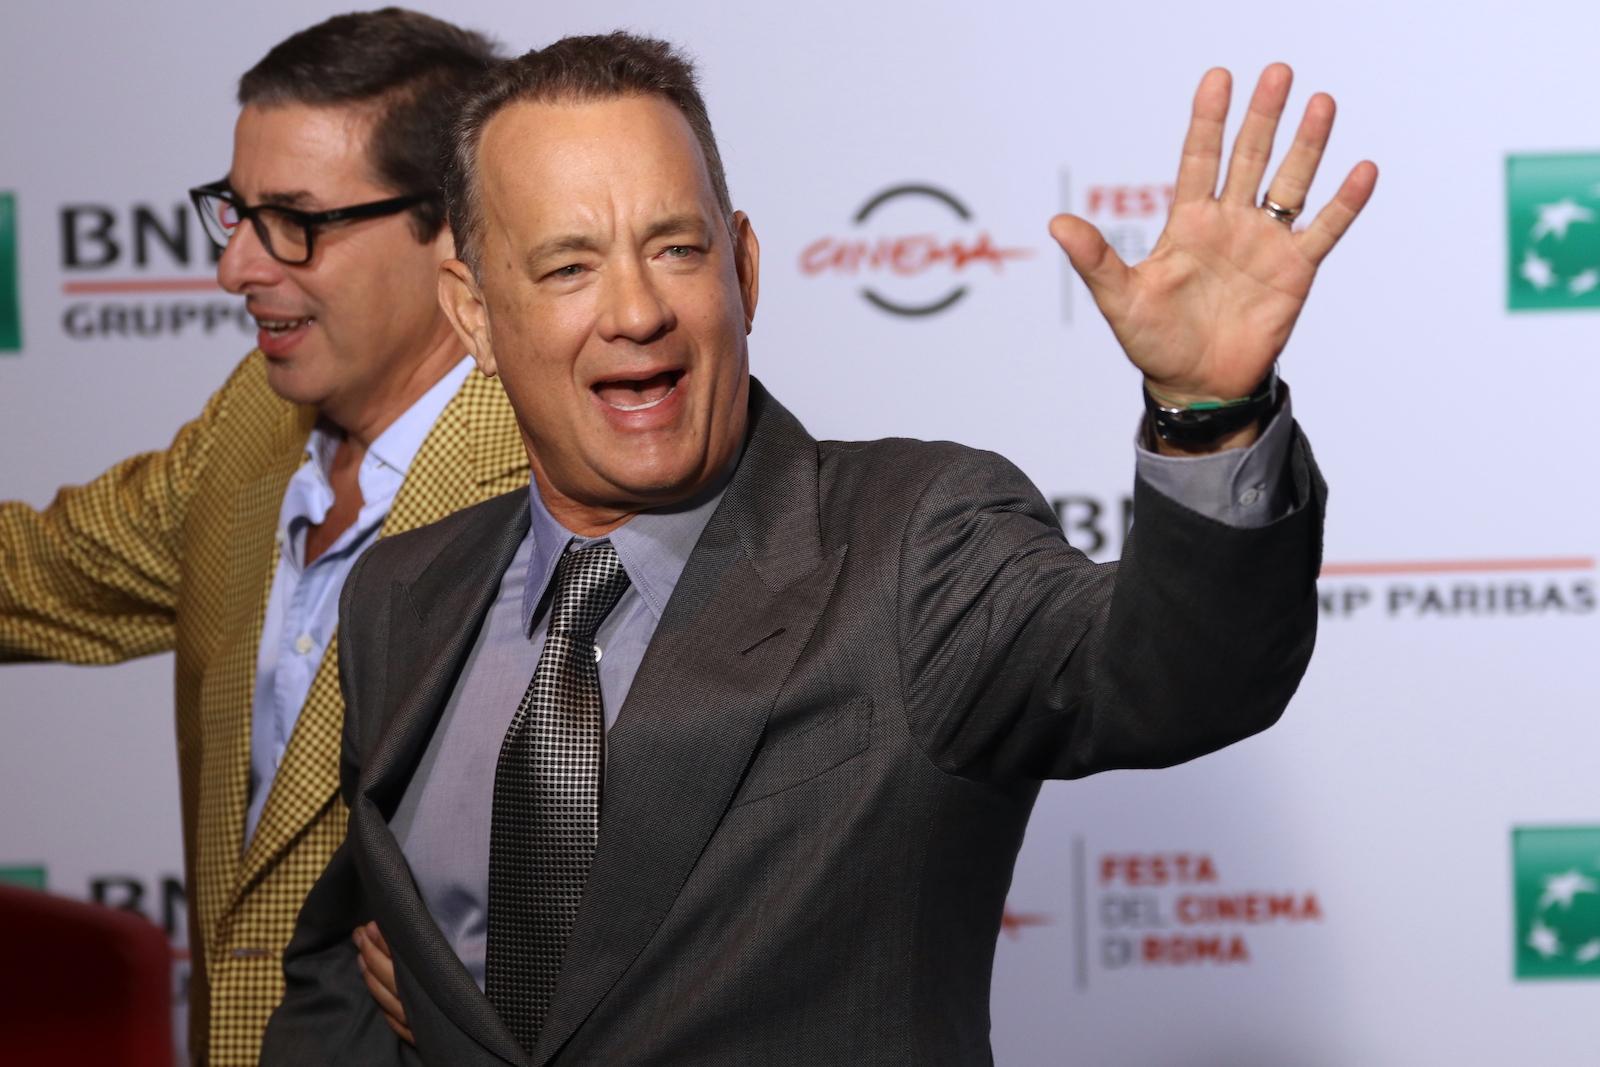 Roma 2016: Tom Hanks saluta i fotografi al photocall